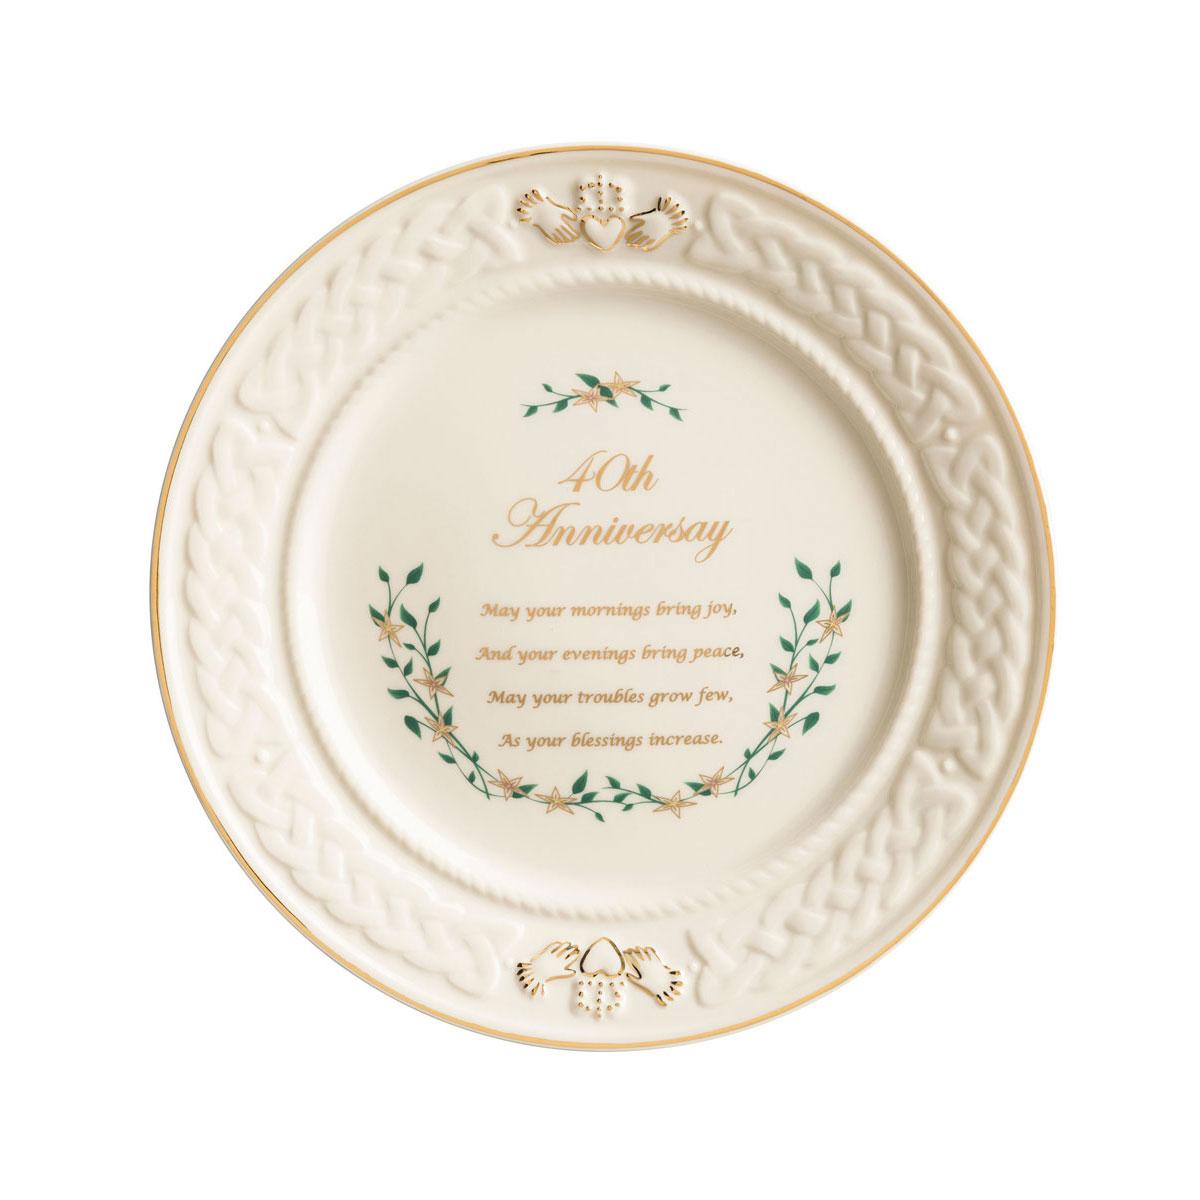 Belleek Celebration 40th Anniversary Plate